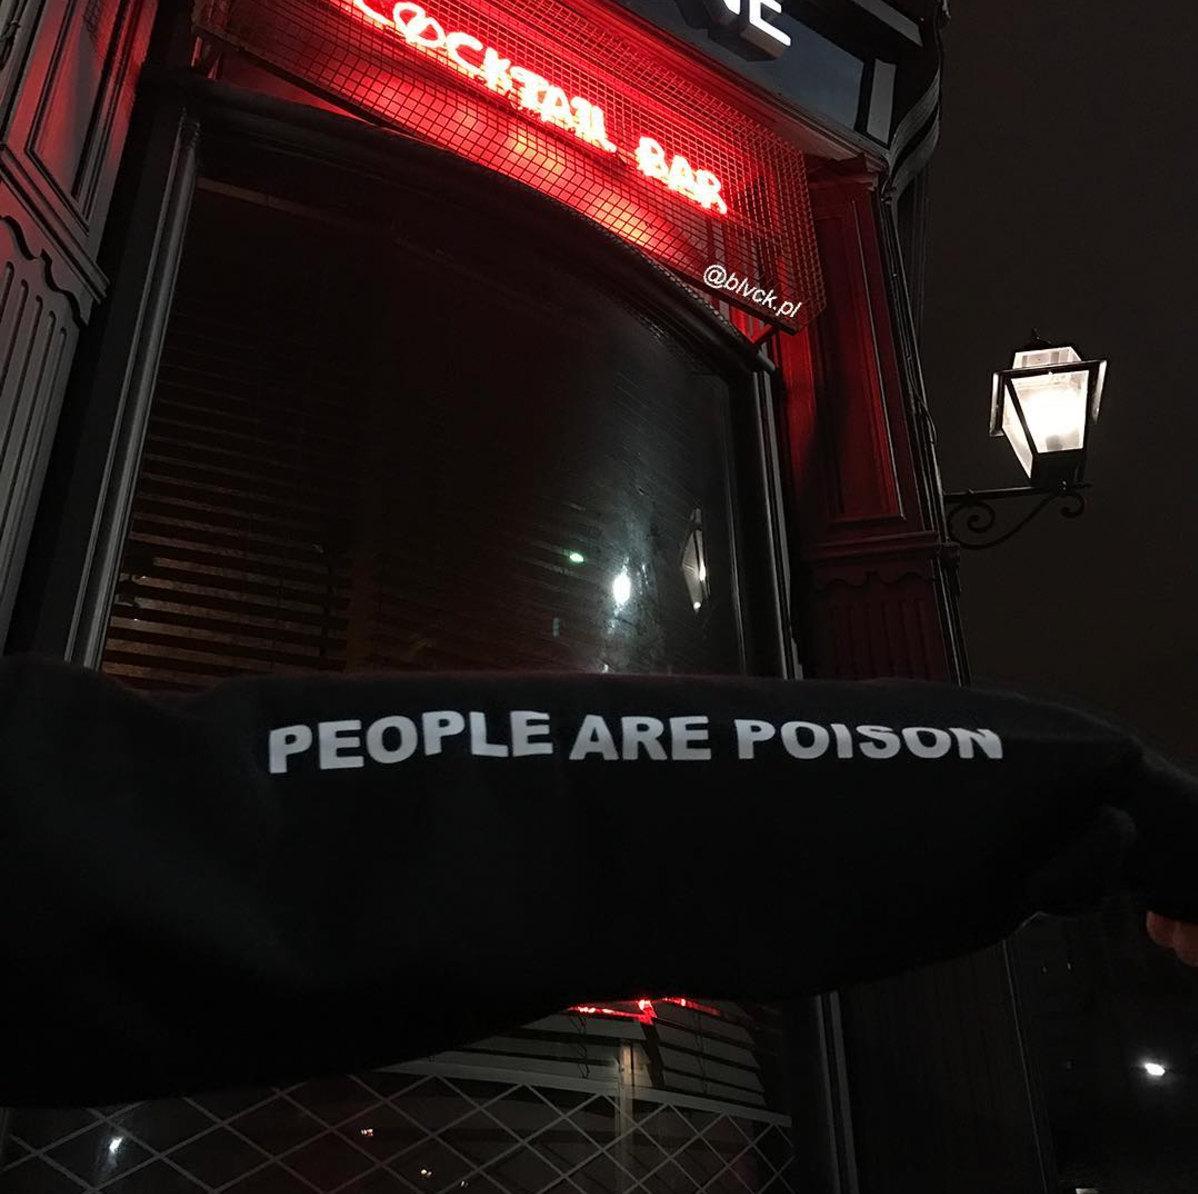 HTB1VhVZQVXXXXcjXpXXq6xXFXXXc - Black Hoodie Sweatshirt People Are Poison Rose